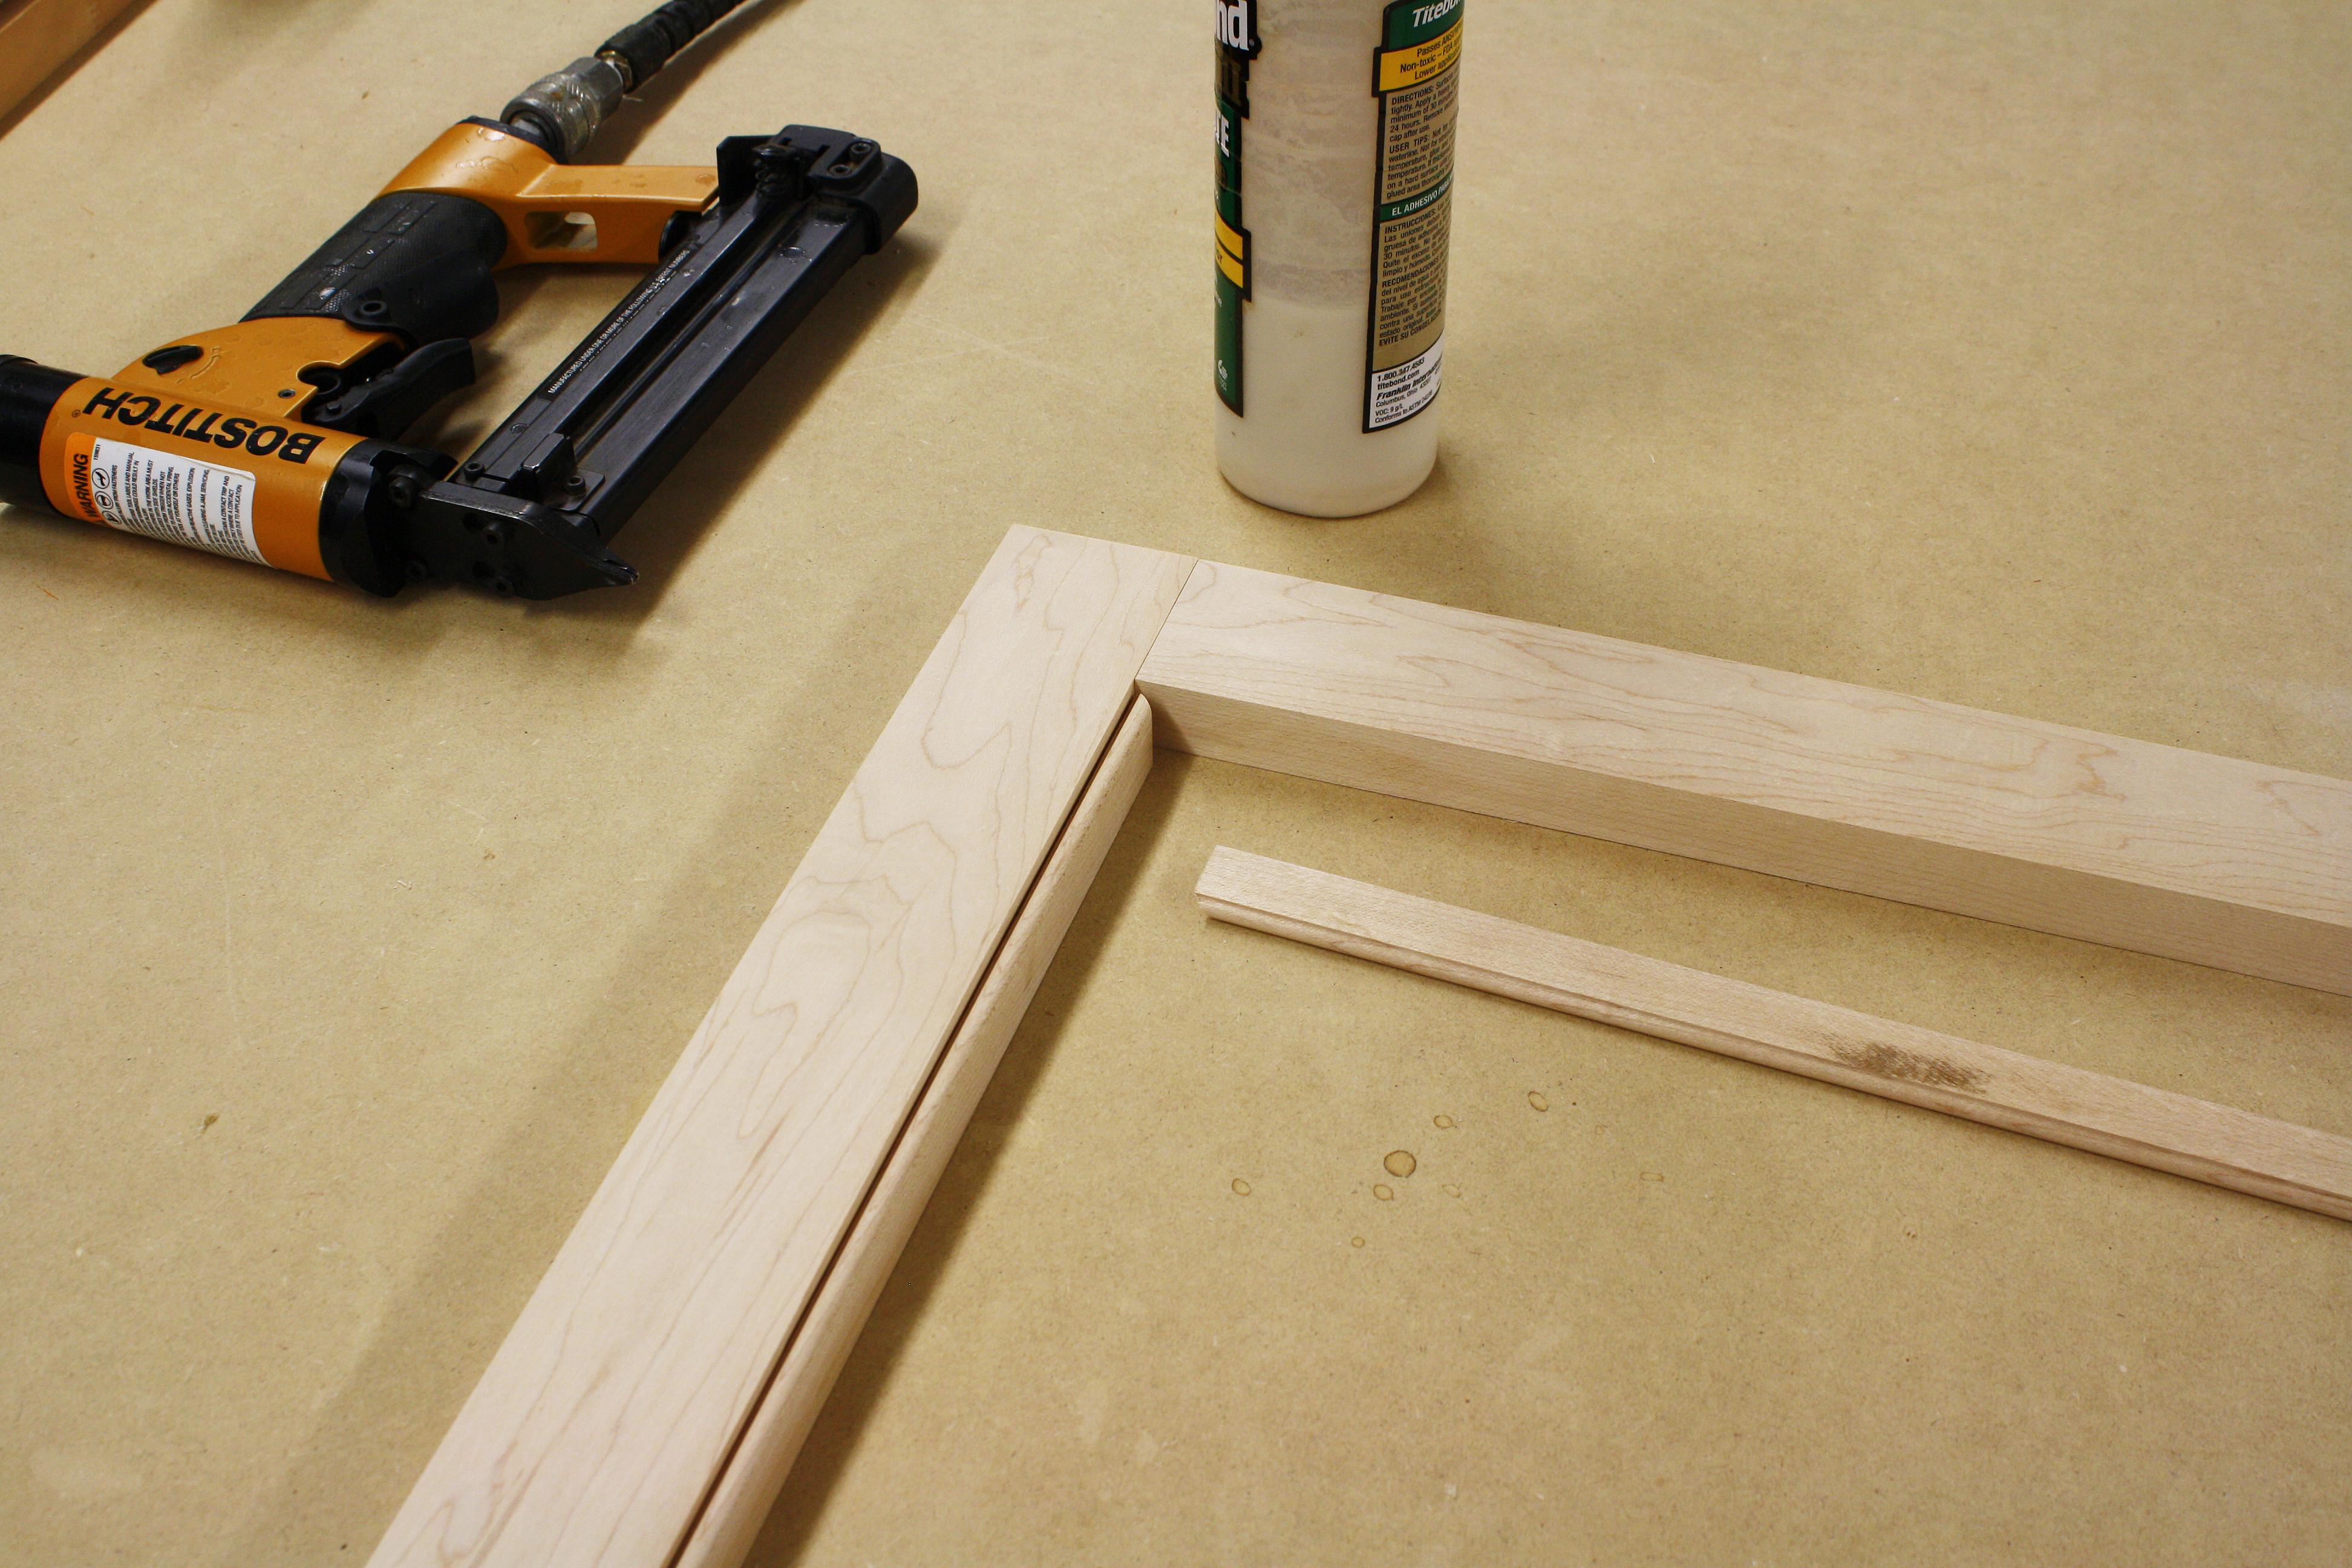 bff-applied-moulding-1-hoffmann-usa.jpg